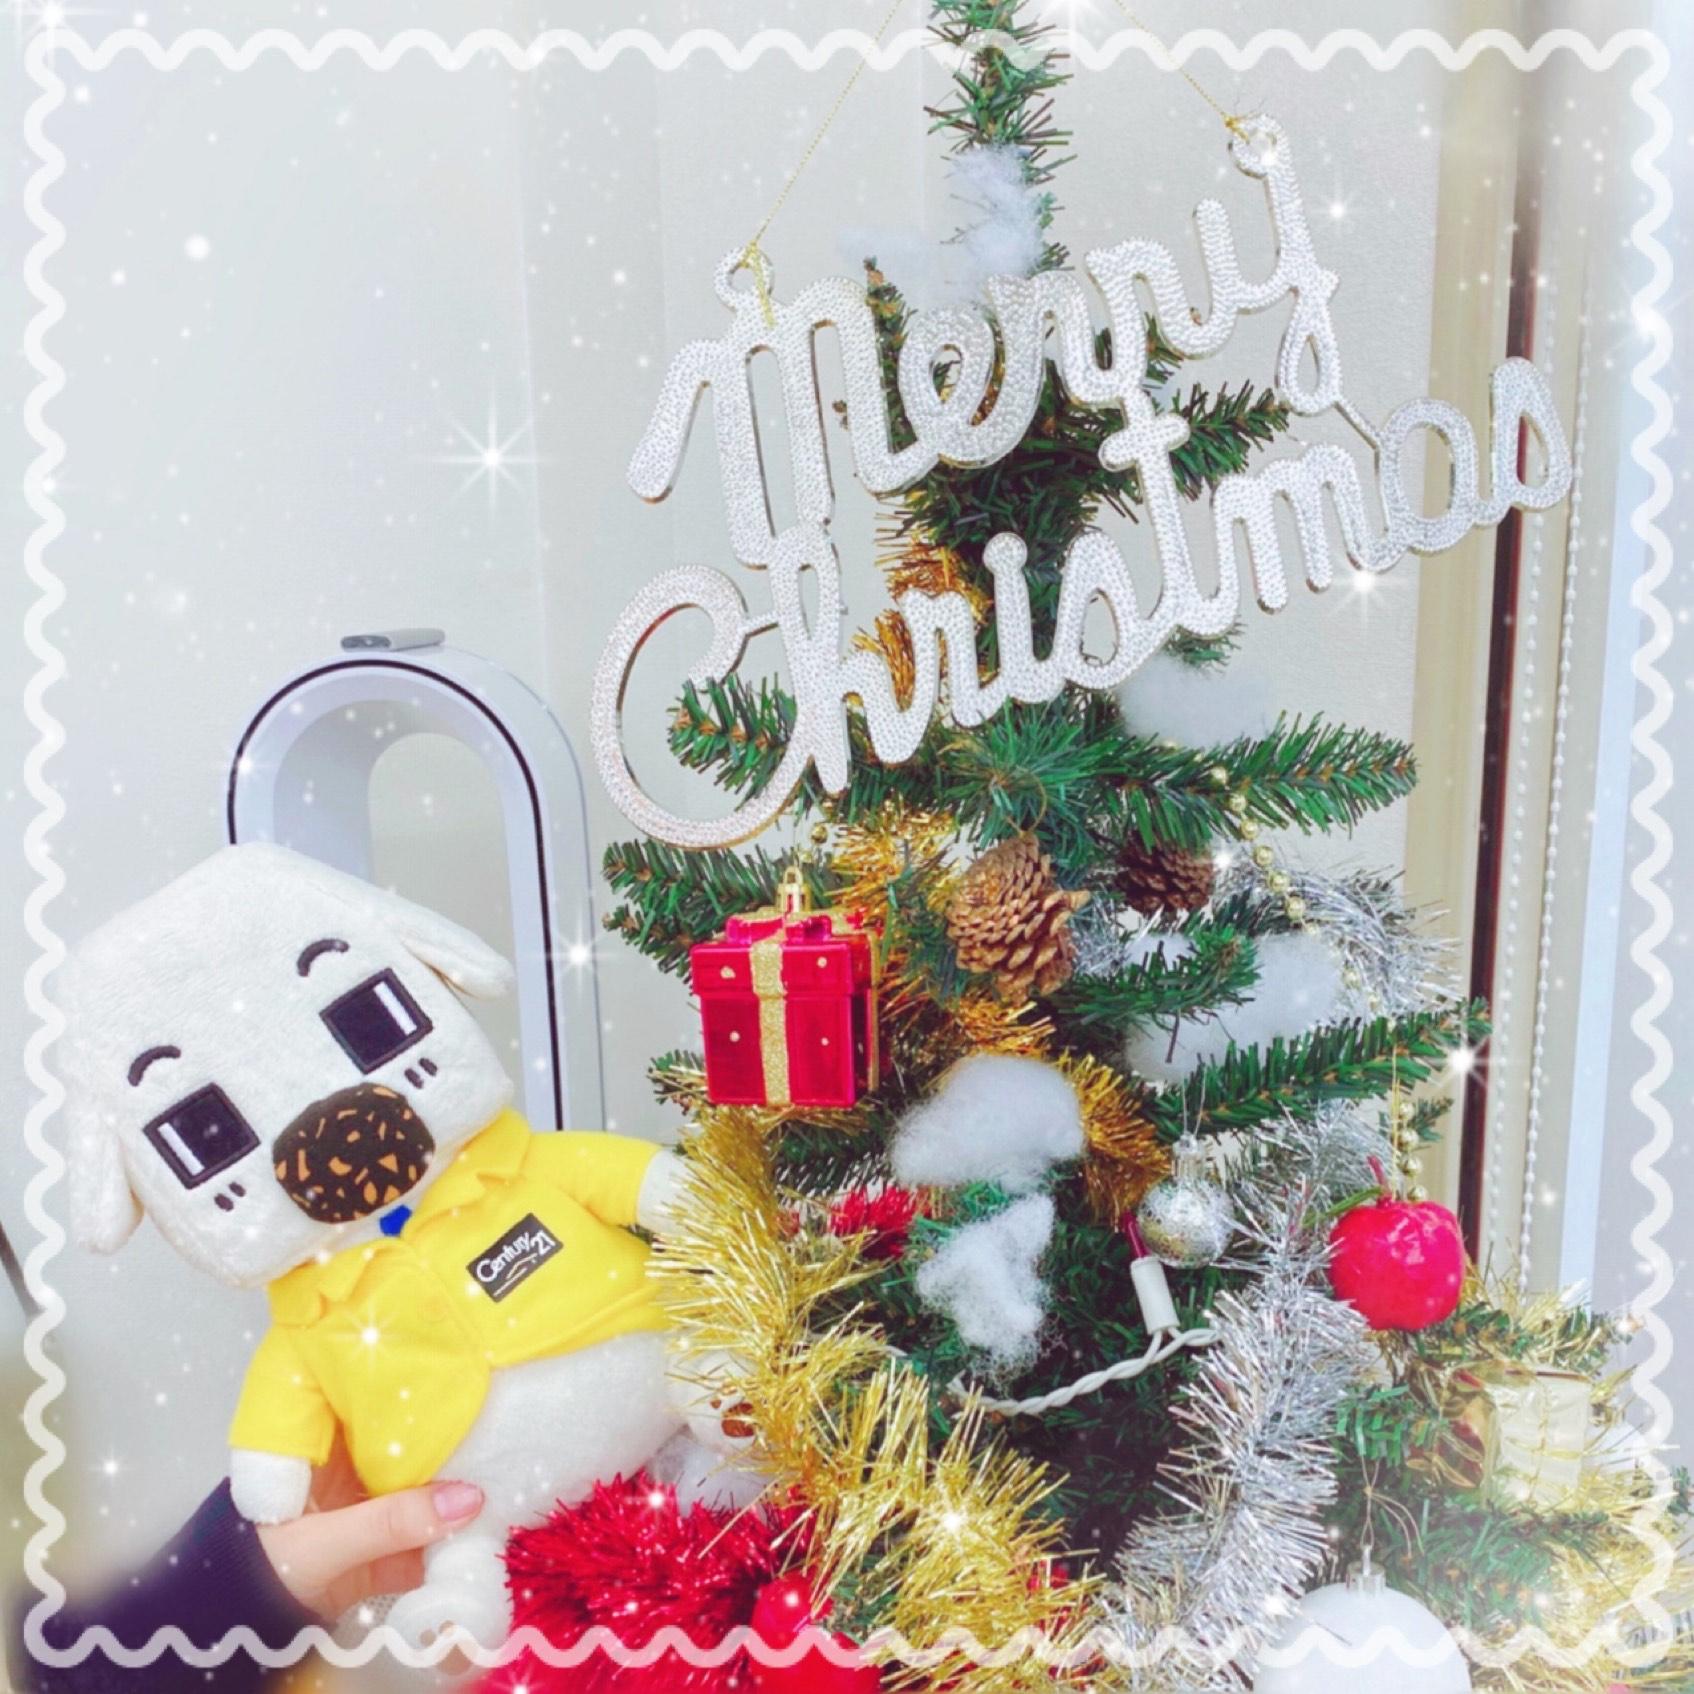 ◆◇Merry Christmas◇◆